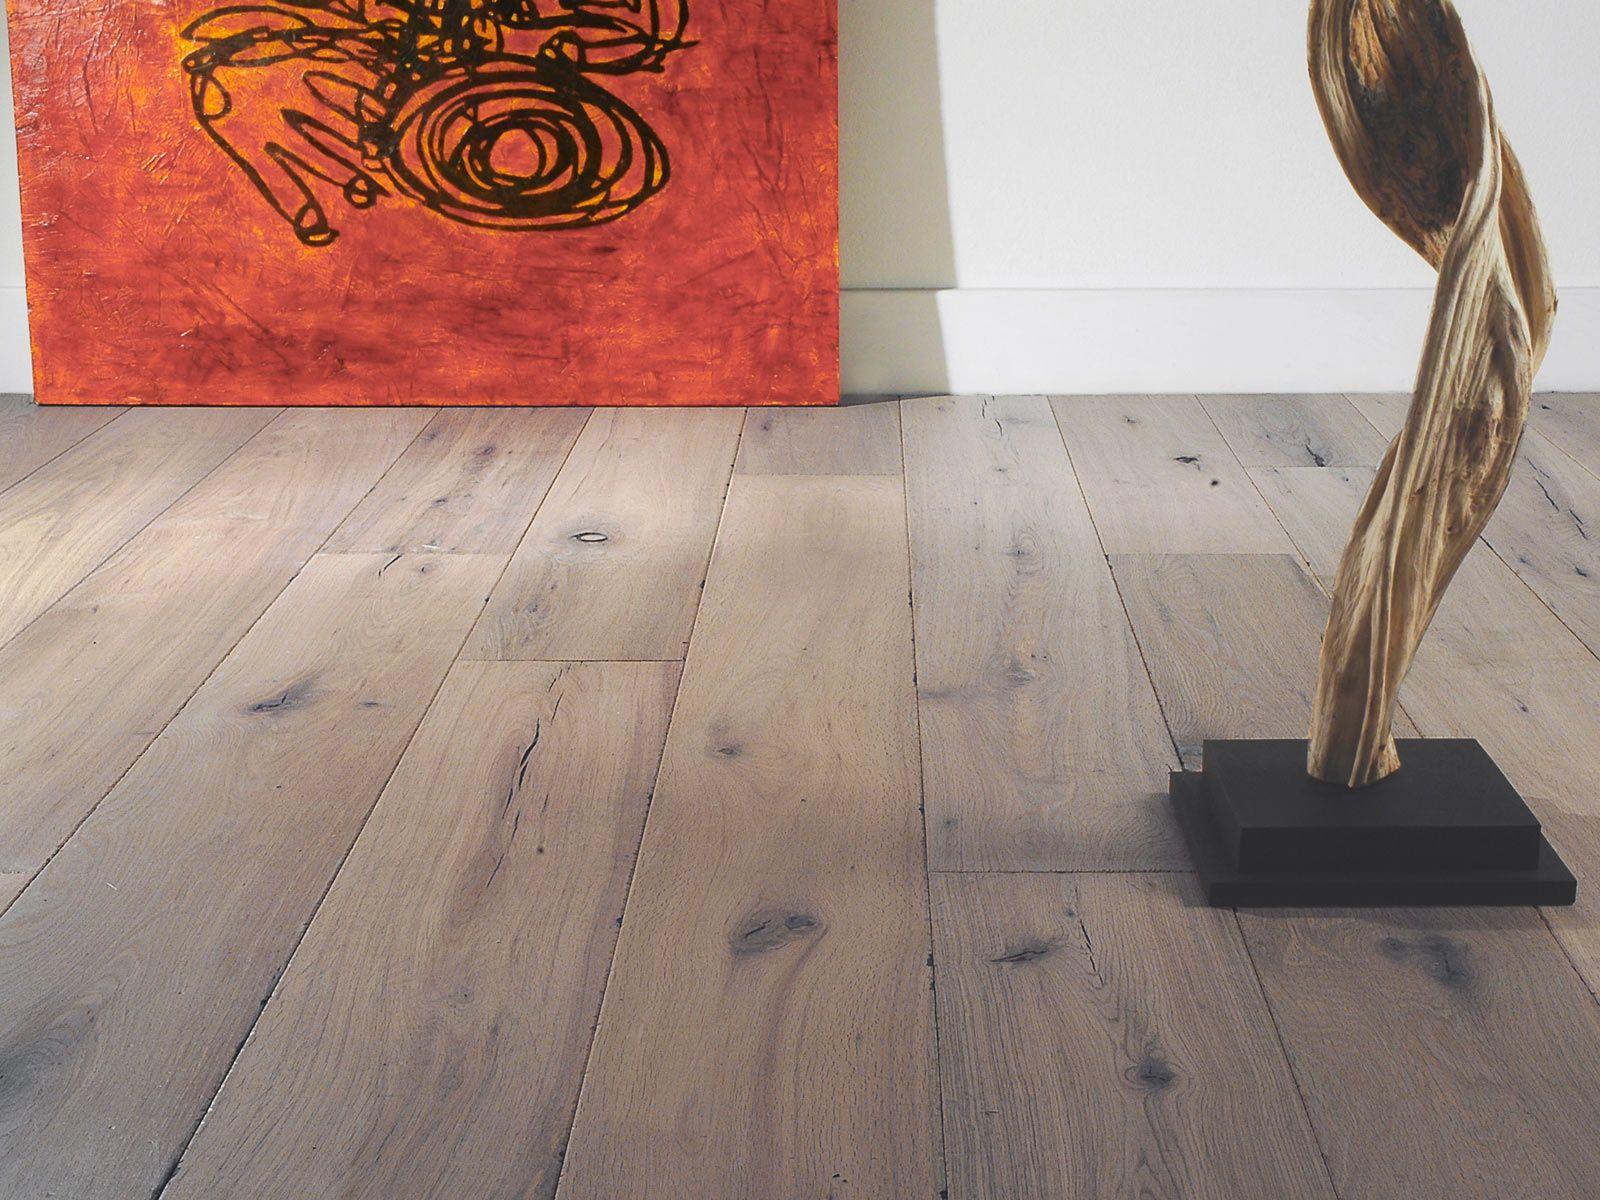 Antique White Oak Hardwood Flooring Oil Floor Chateau Floor